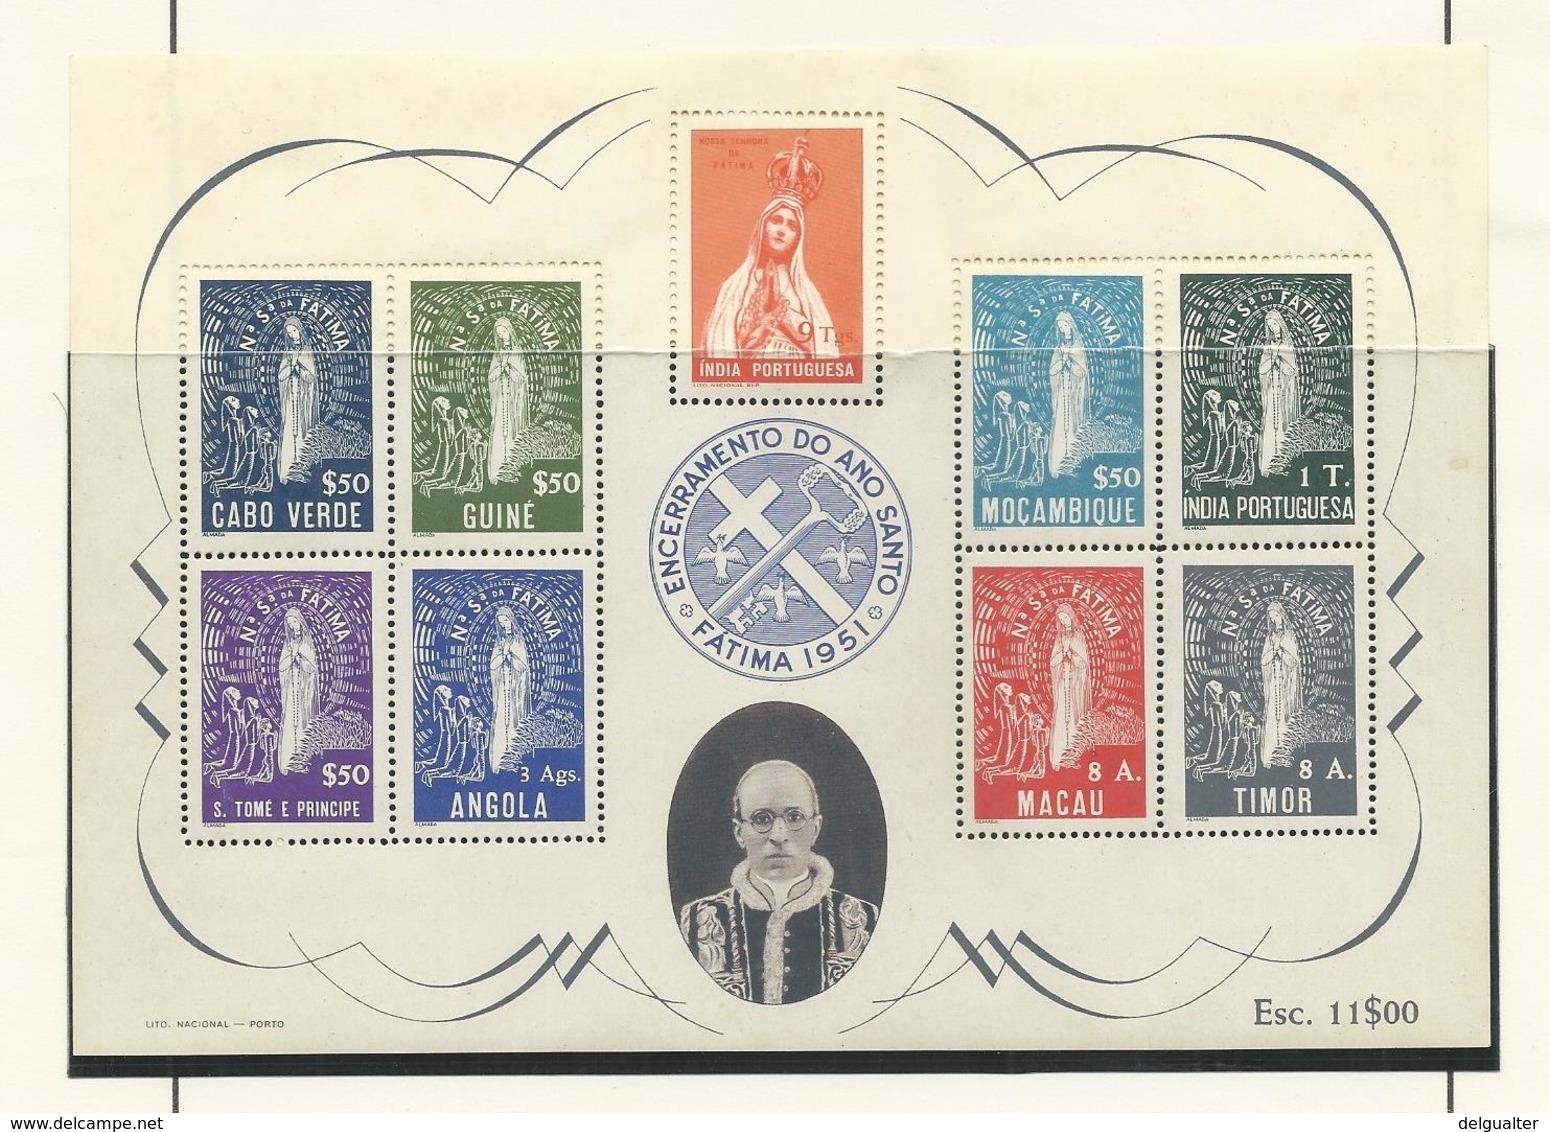 Índia - Block - Encerramento Do Ano Santo - Fátima 1951 - Inde Portugaise